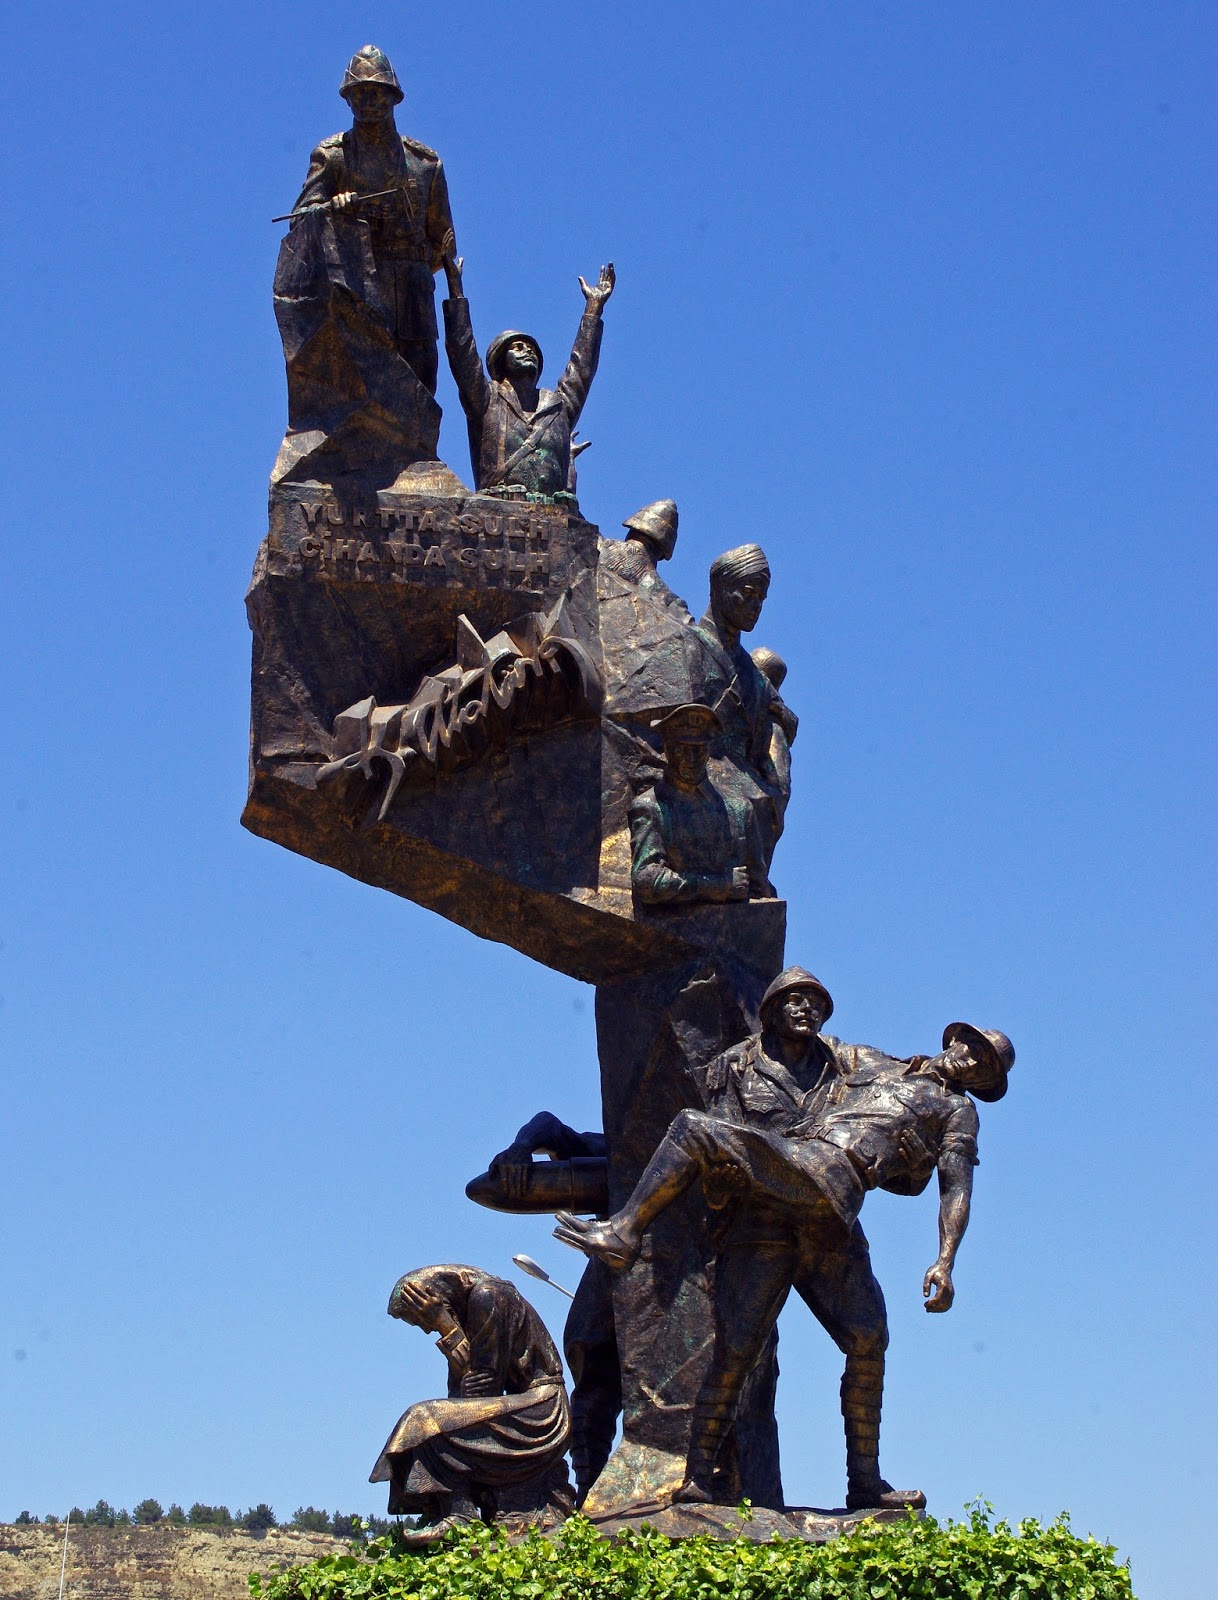 Gallipoli bronze memorial statue